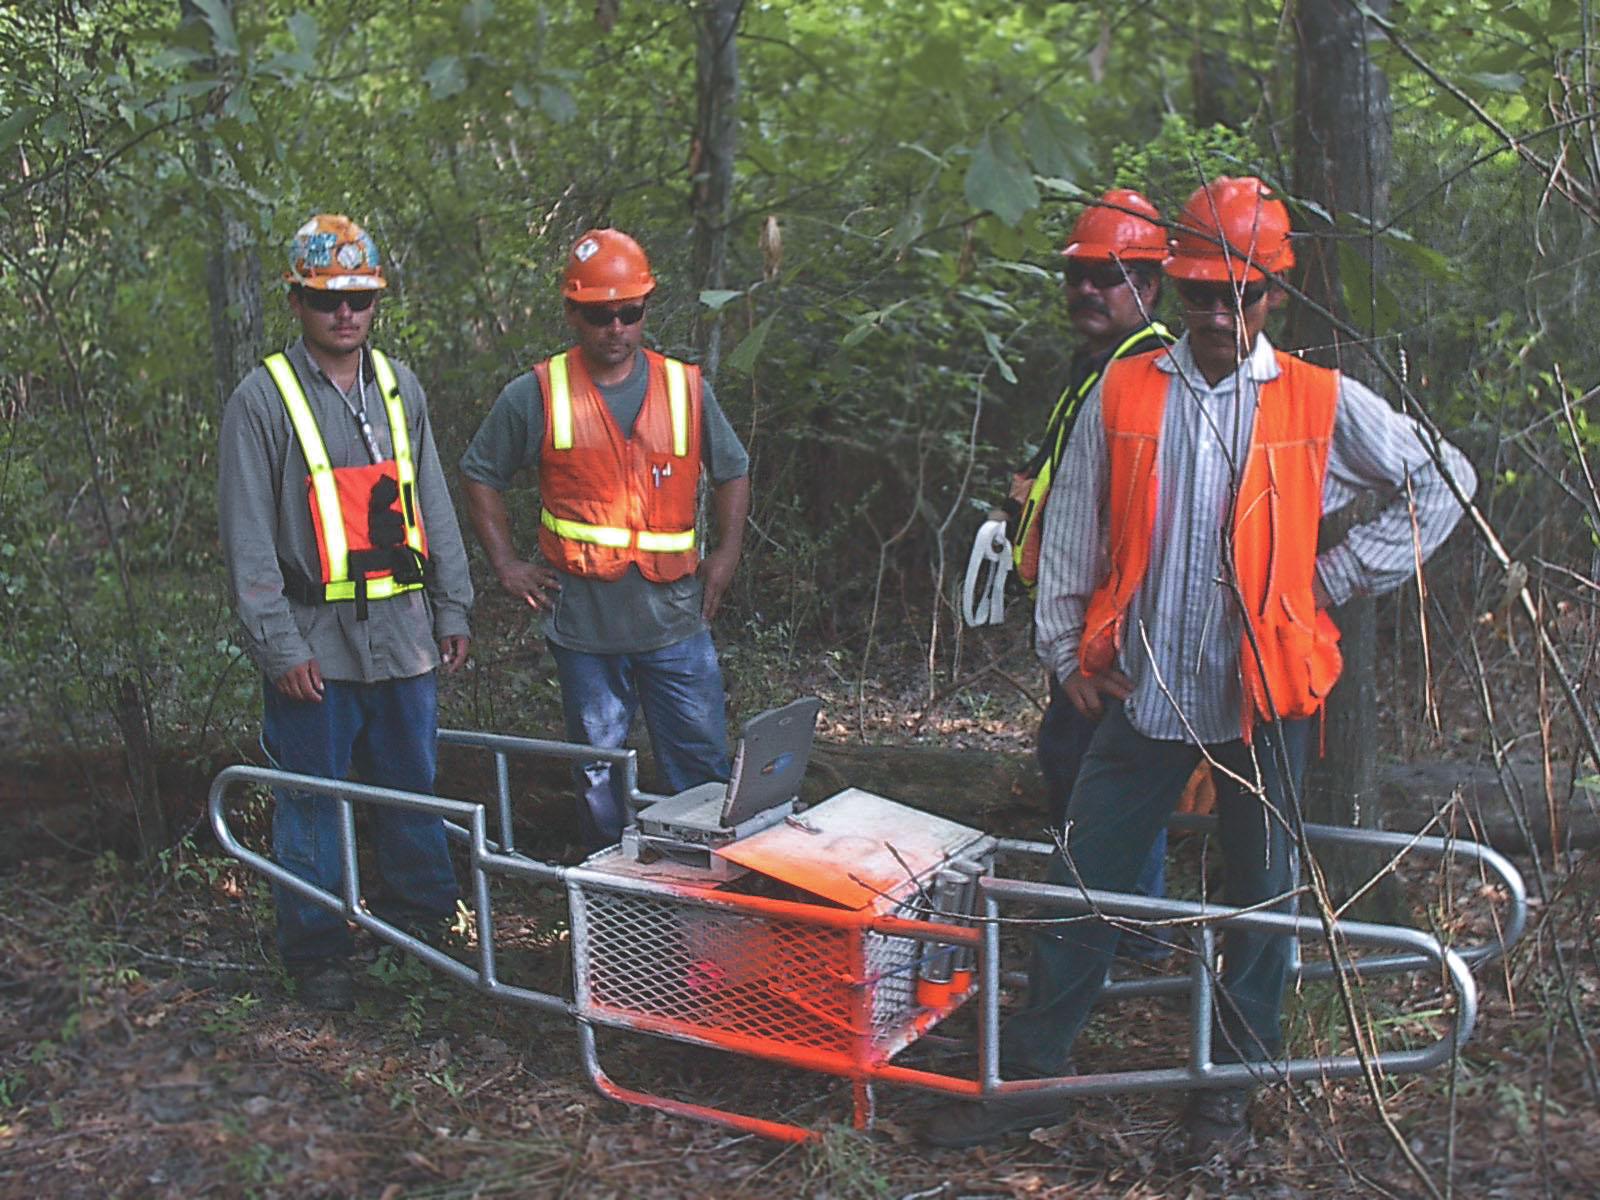 2004 - Inertial Land Survey - Proprietary inertial survey instruments created